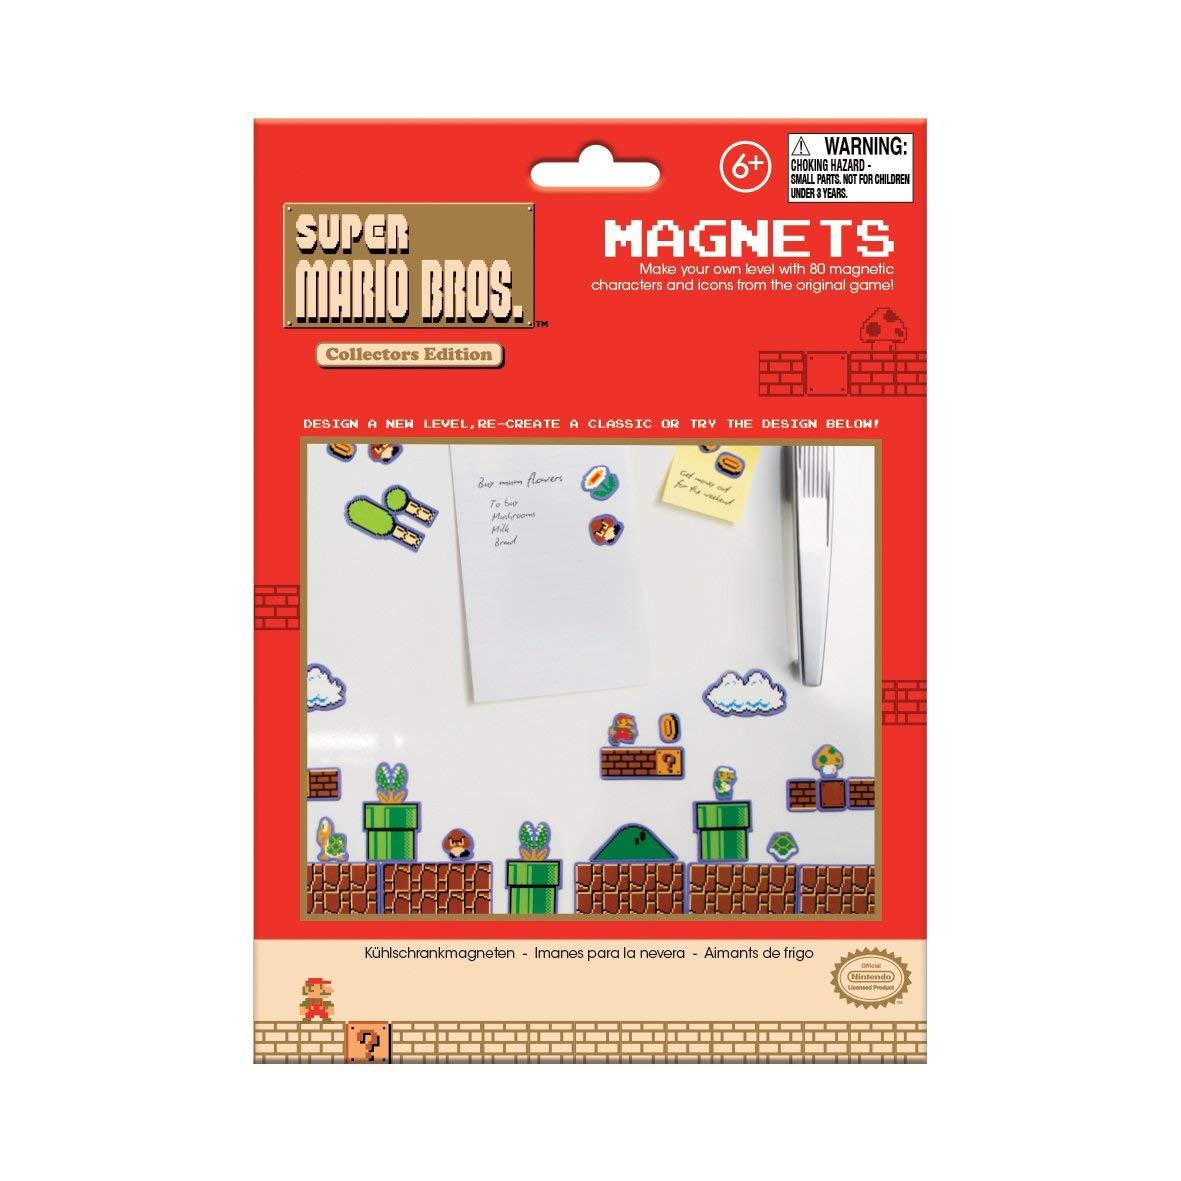 Super Mario Bros Magnets - Creative Christmas Gifts